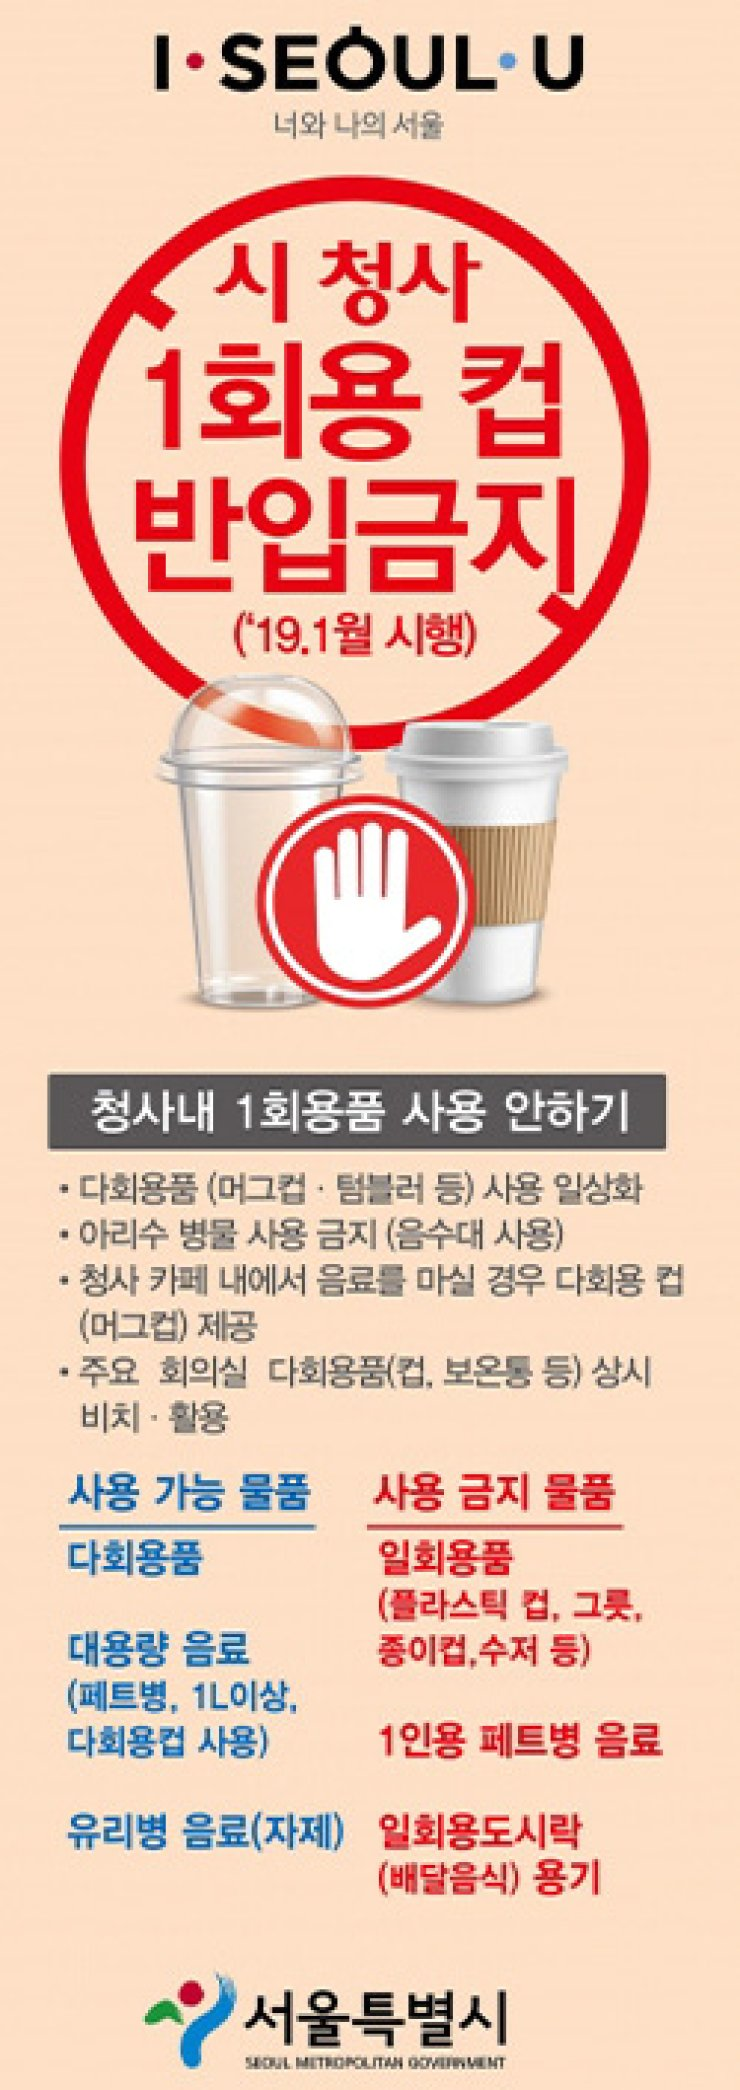 Courtesy of Seoul Metropolitan Government